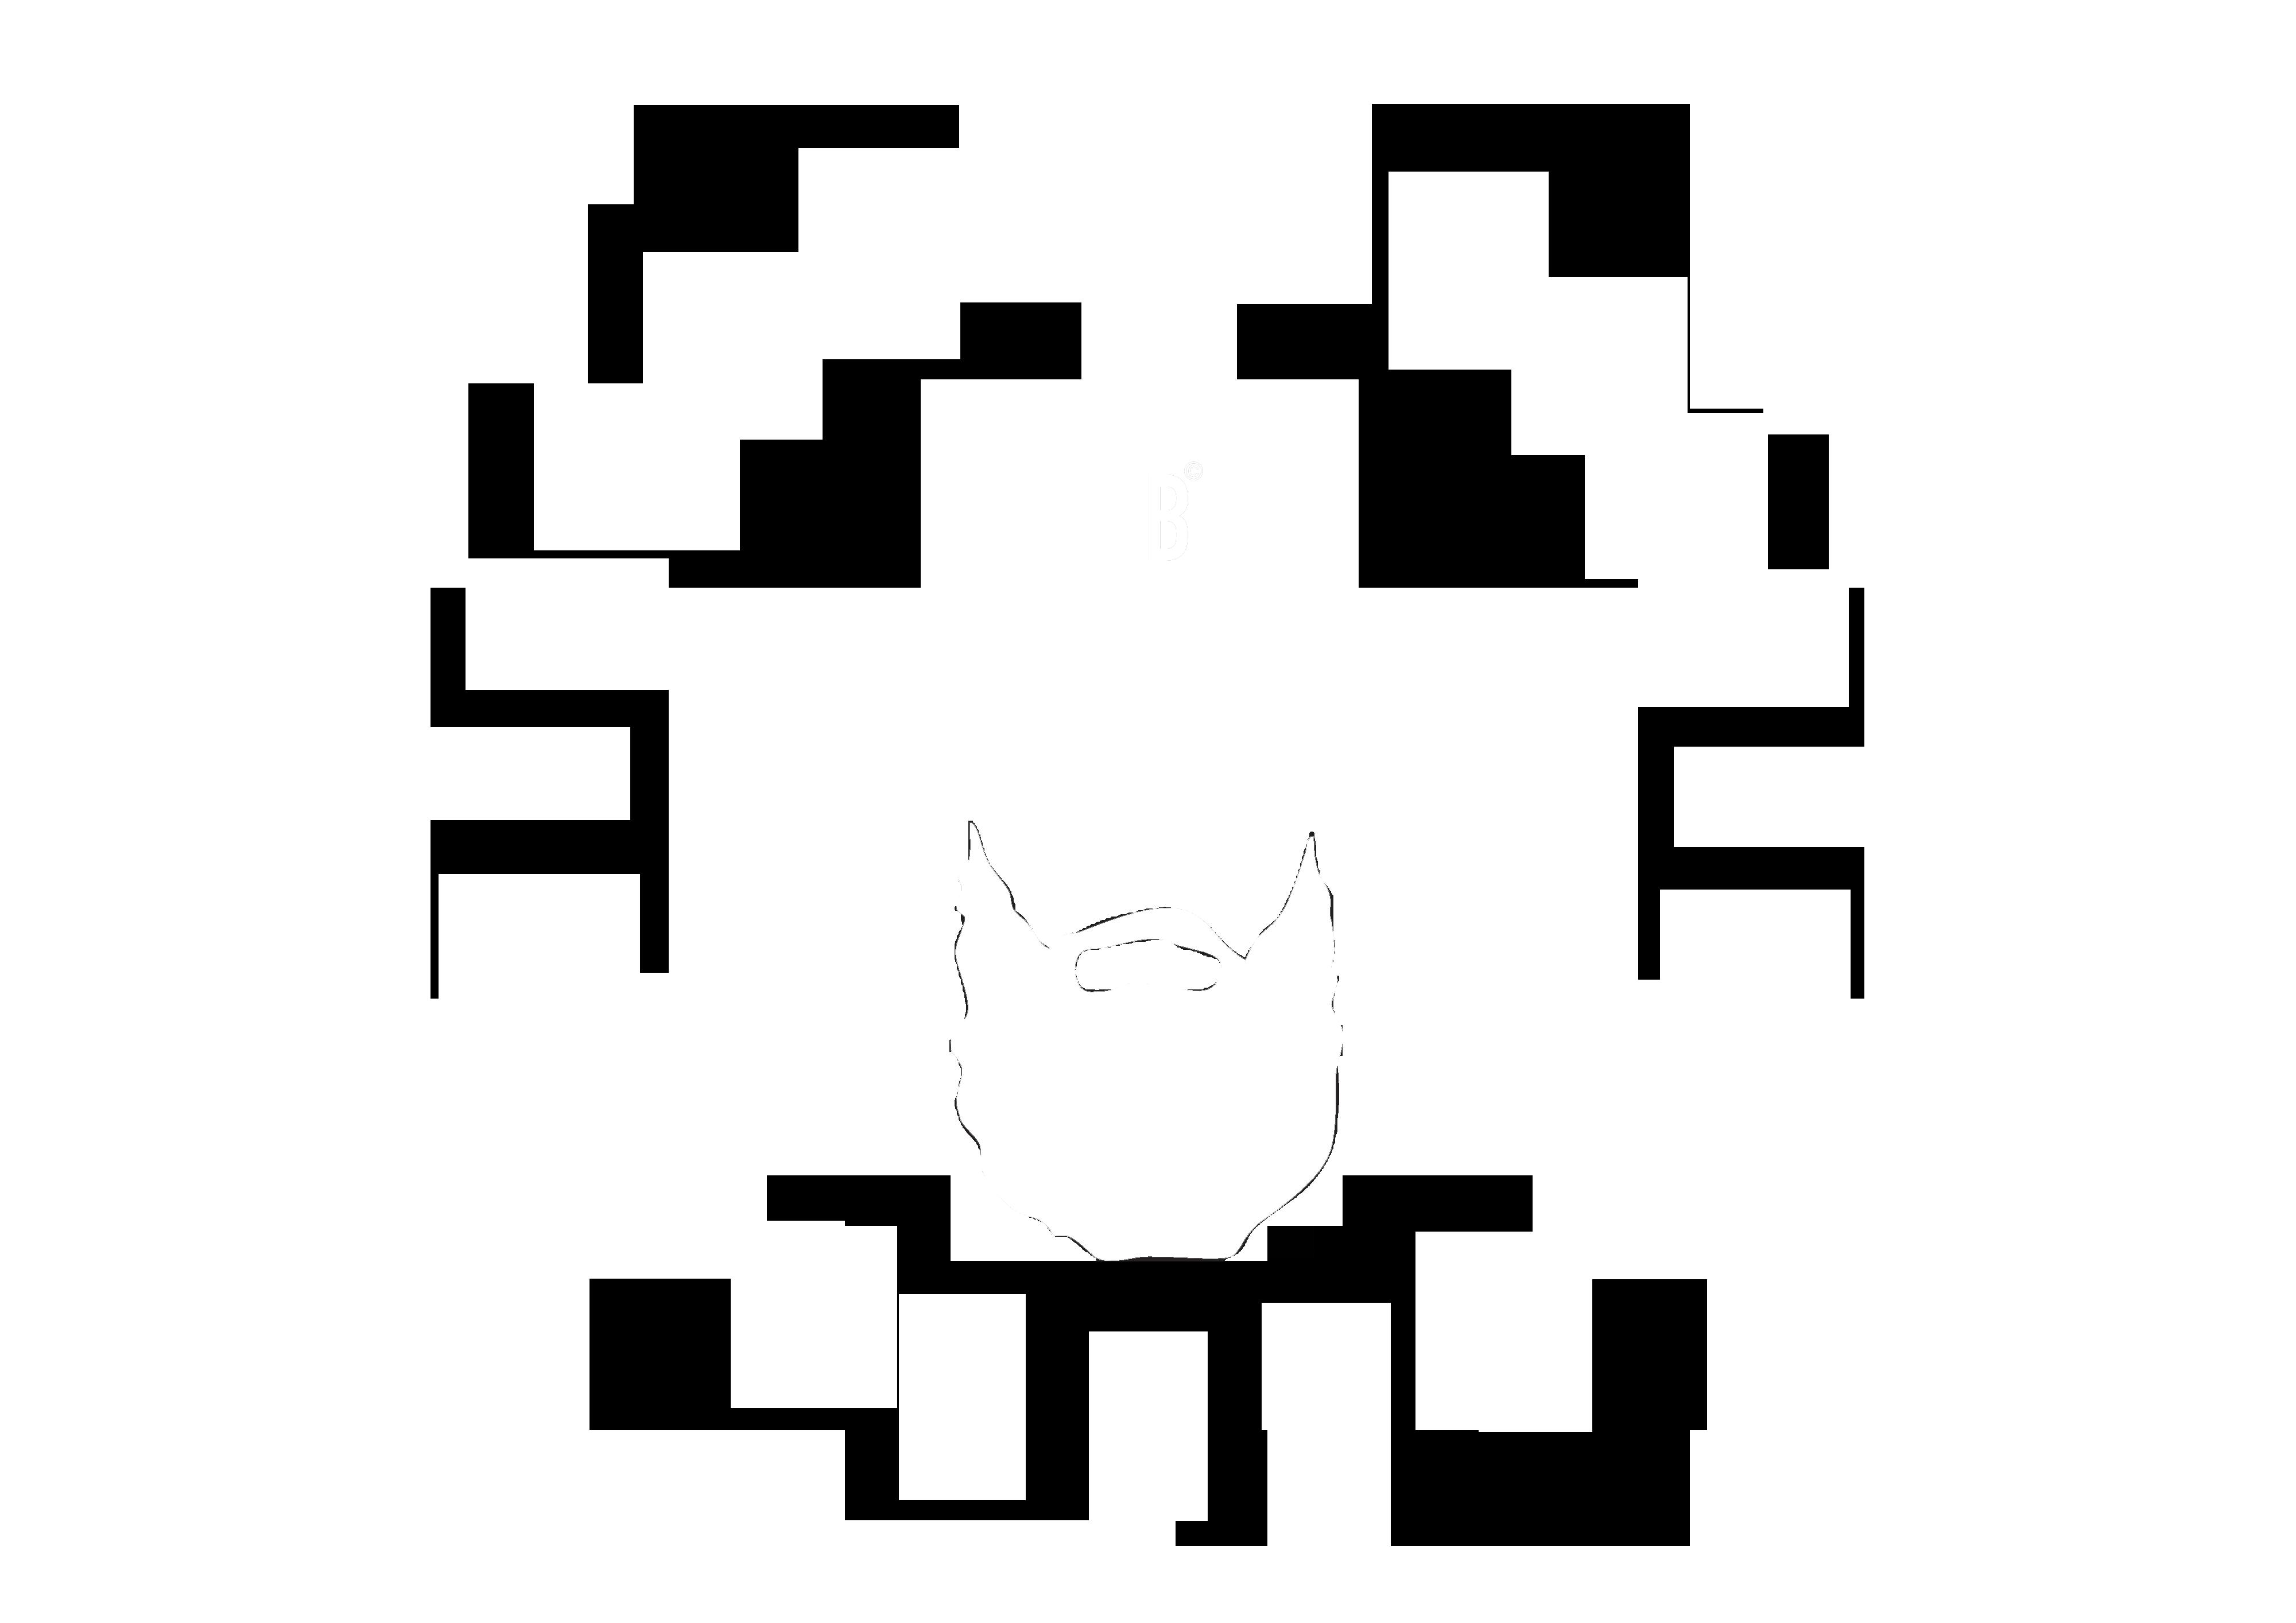 Bearded Butlers